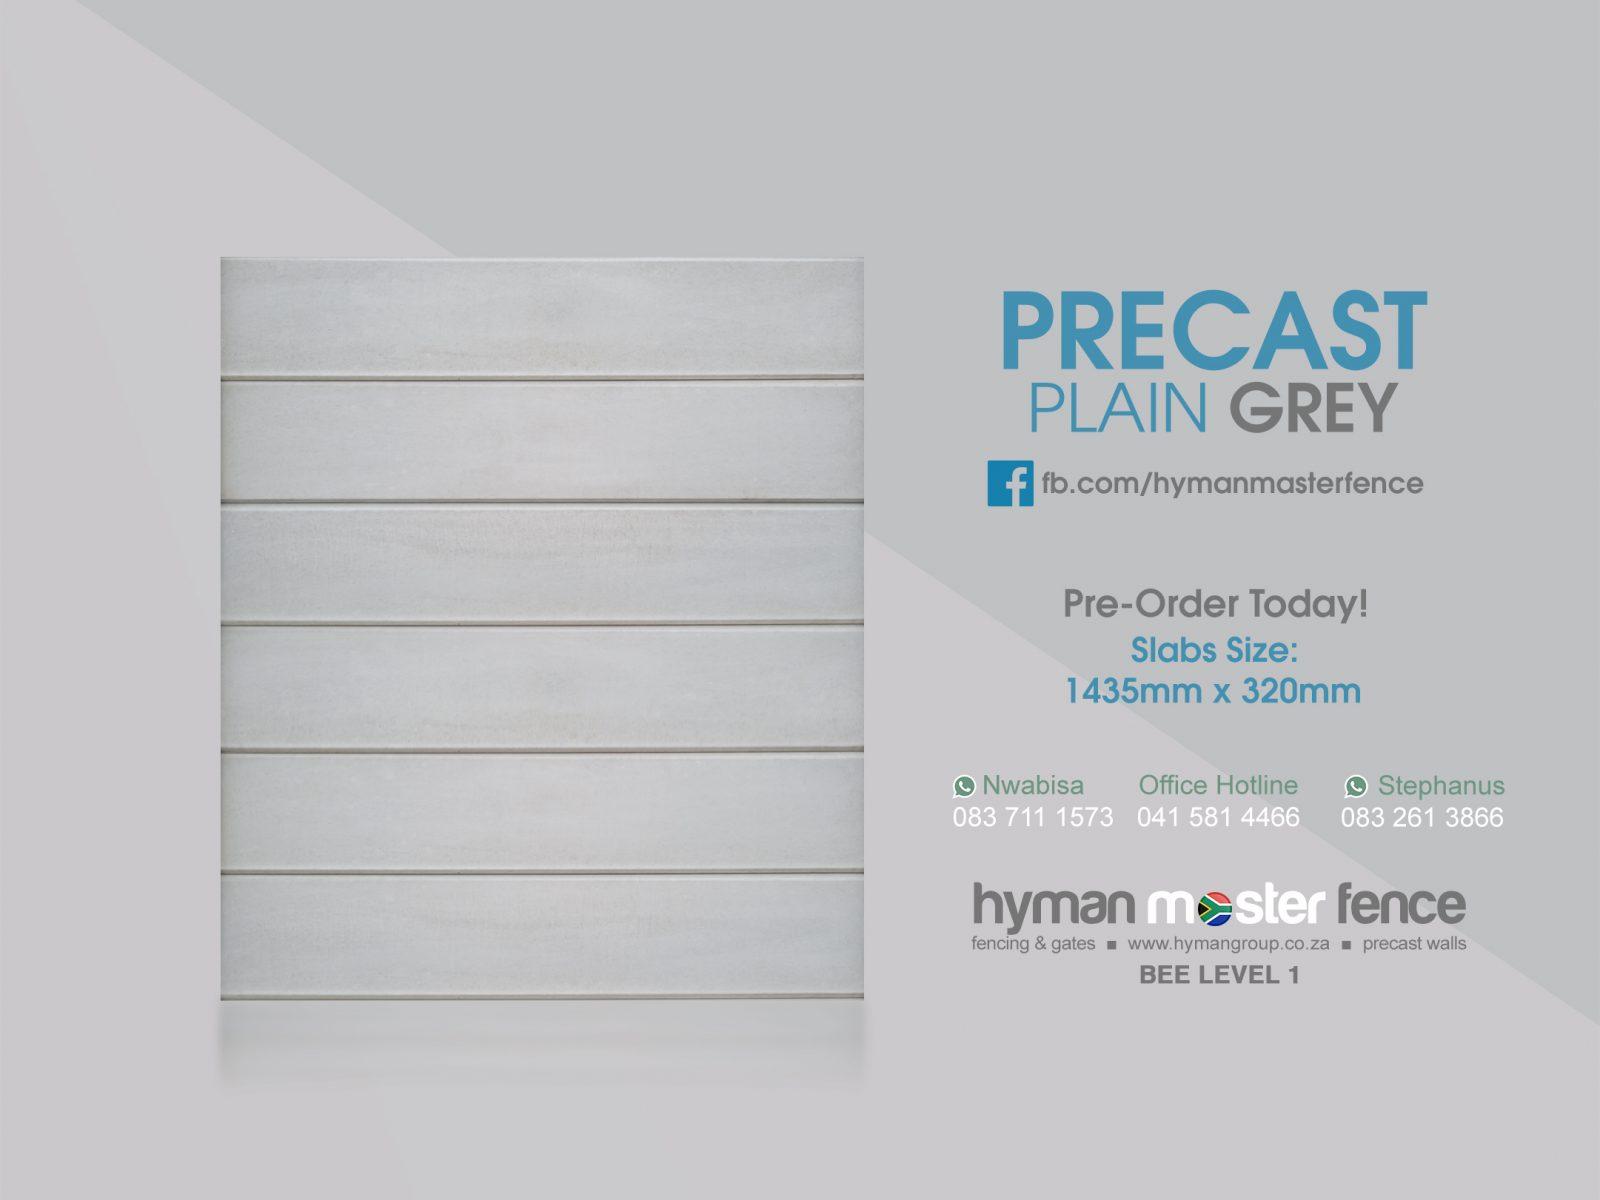 Precast Slabs Plain Grey